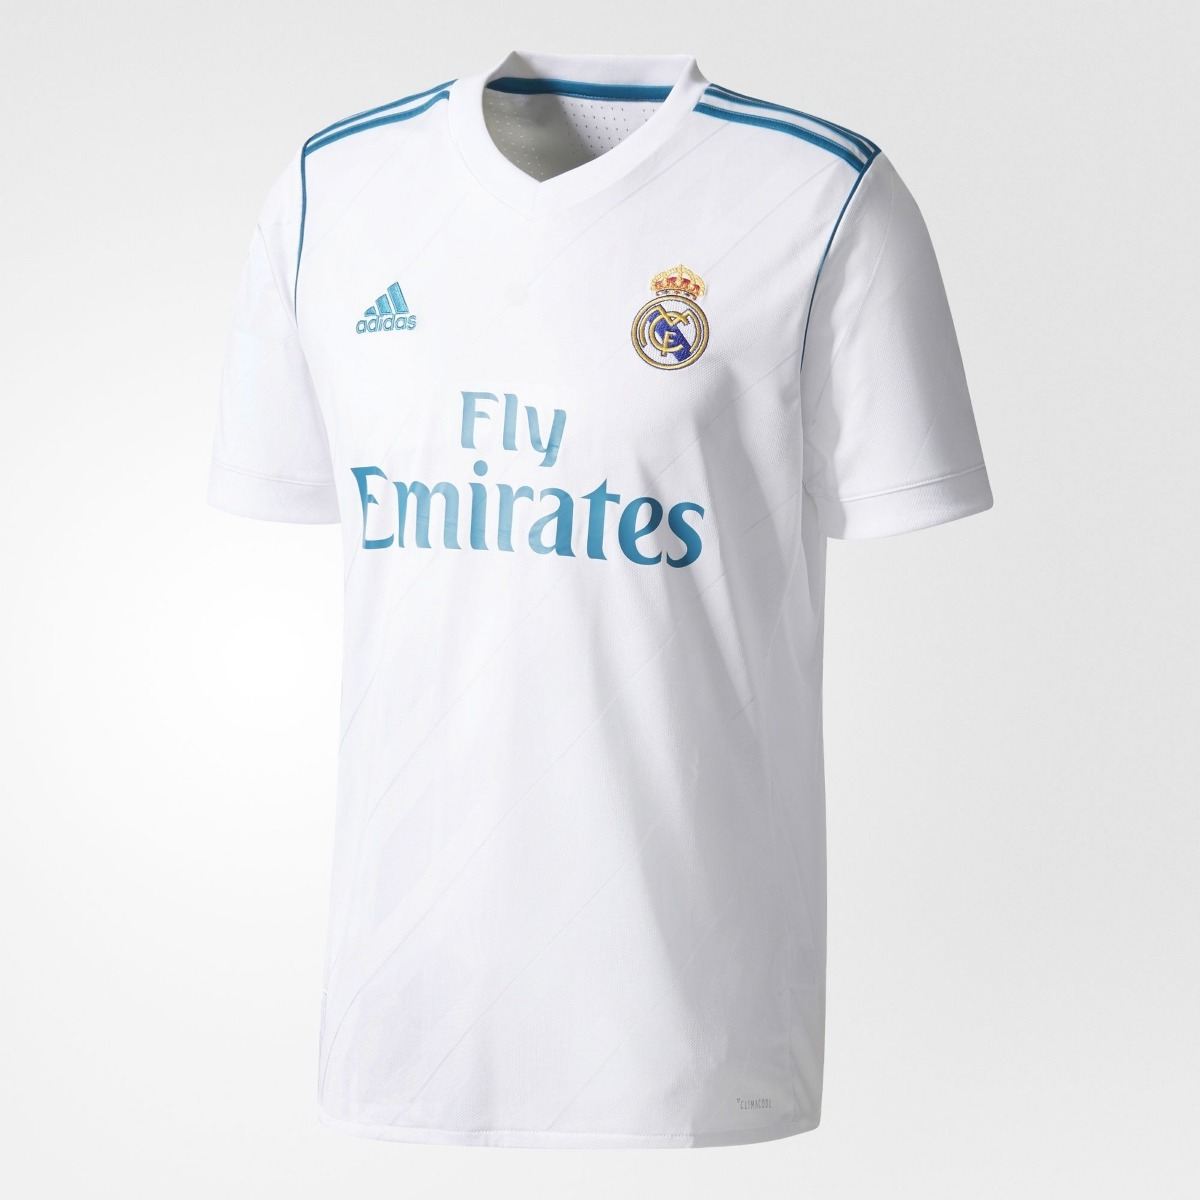 1eff56f048c2b Carregando zoom... camisa camiseta real madrid adulto oficial promoção